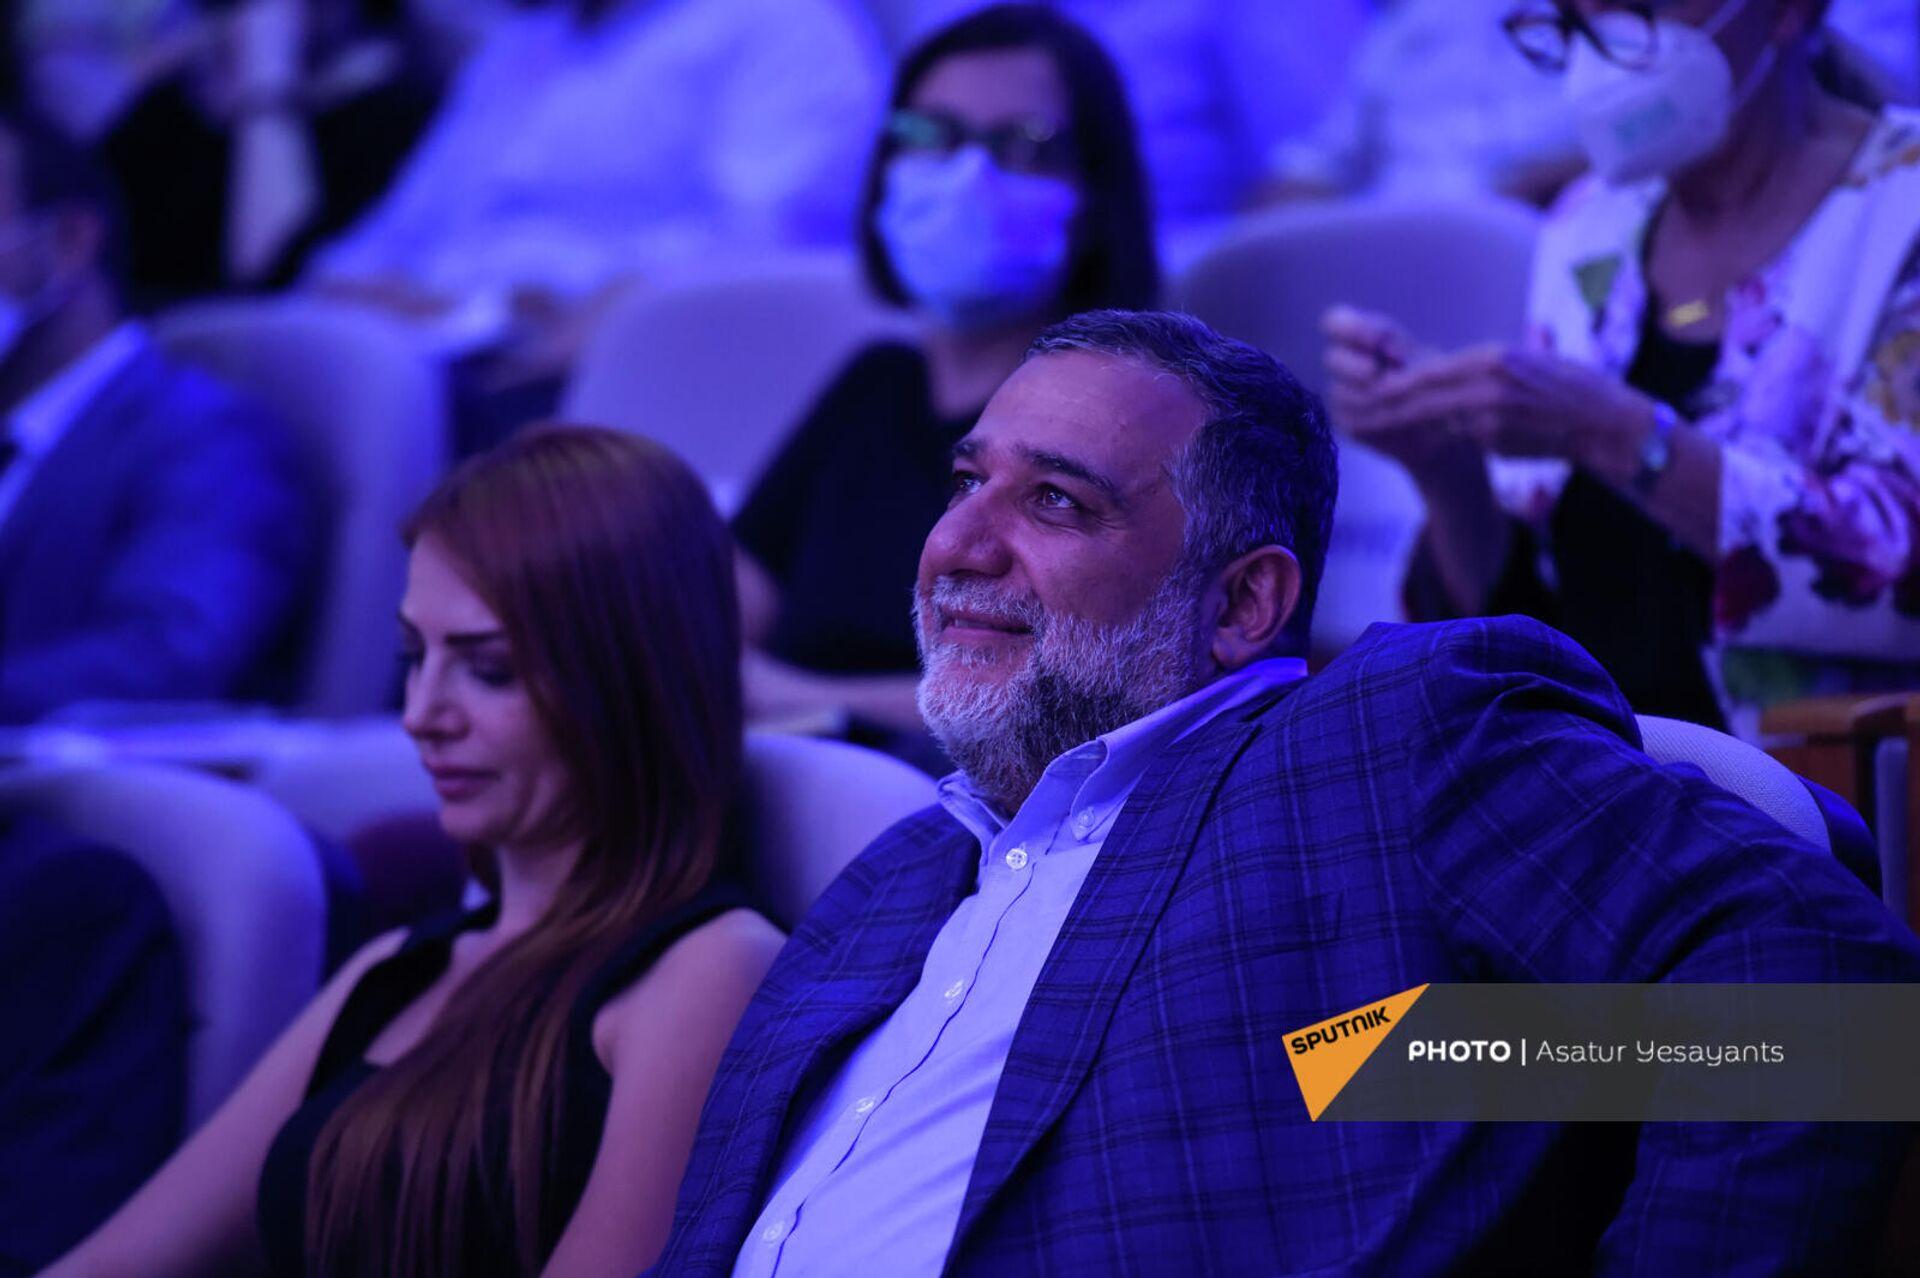 Рубен Варданян на форуме Из Армении 2020 в Армению 2041 (19 сентября 2021). Еревaн - Sputnik Армения, 1920, 19.09.2021